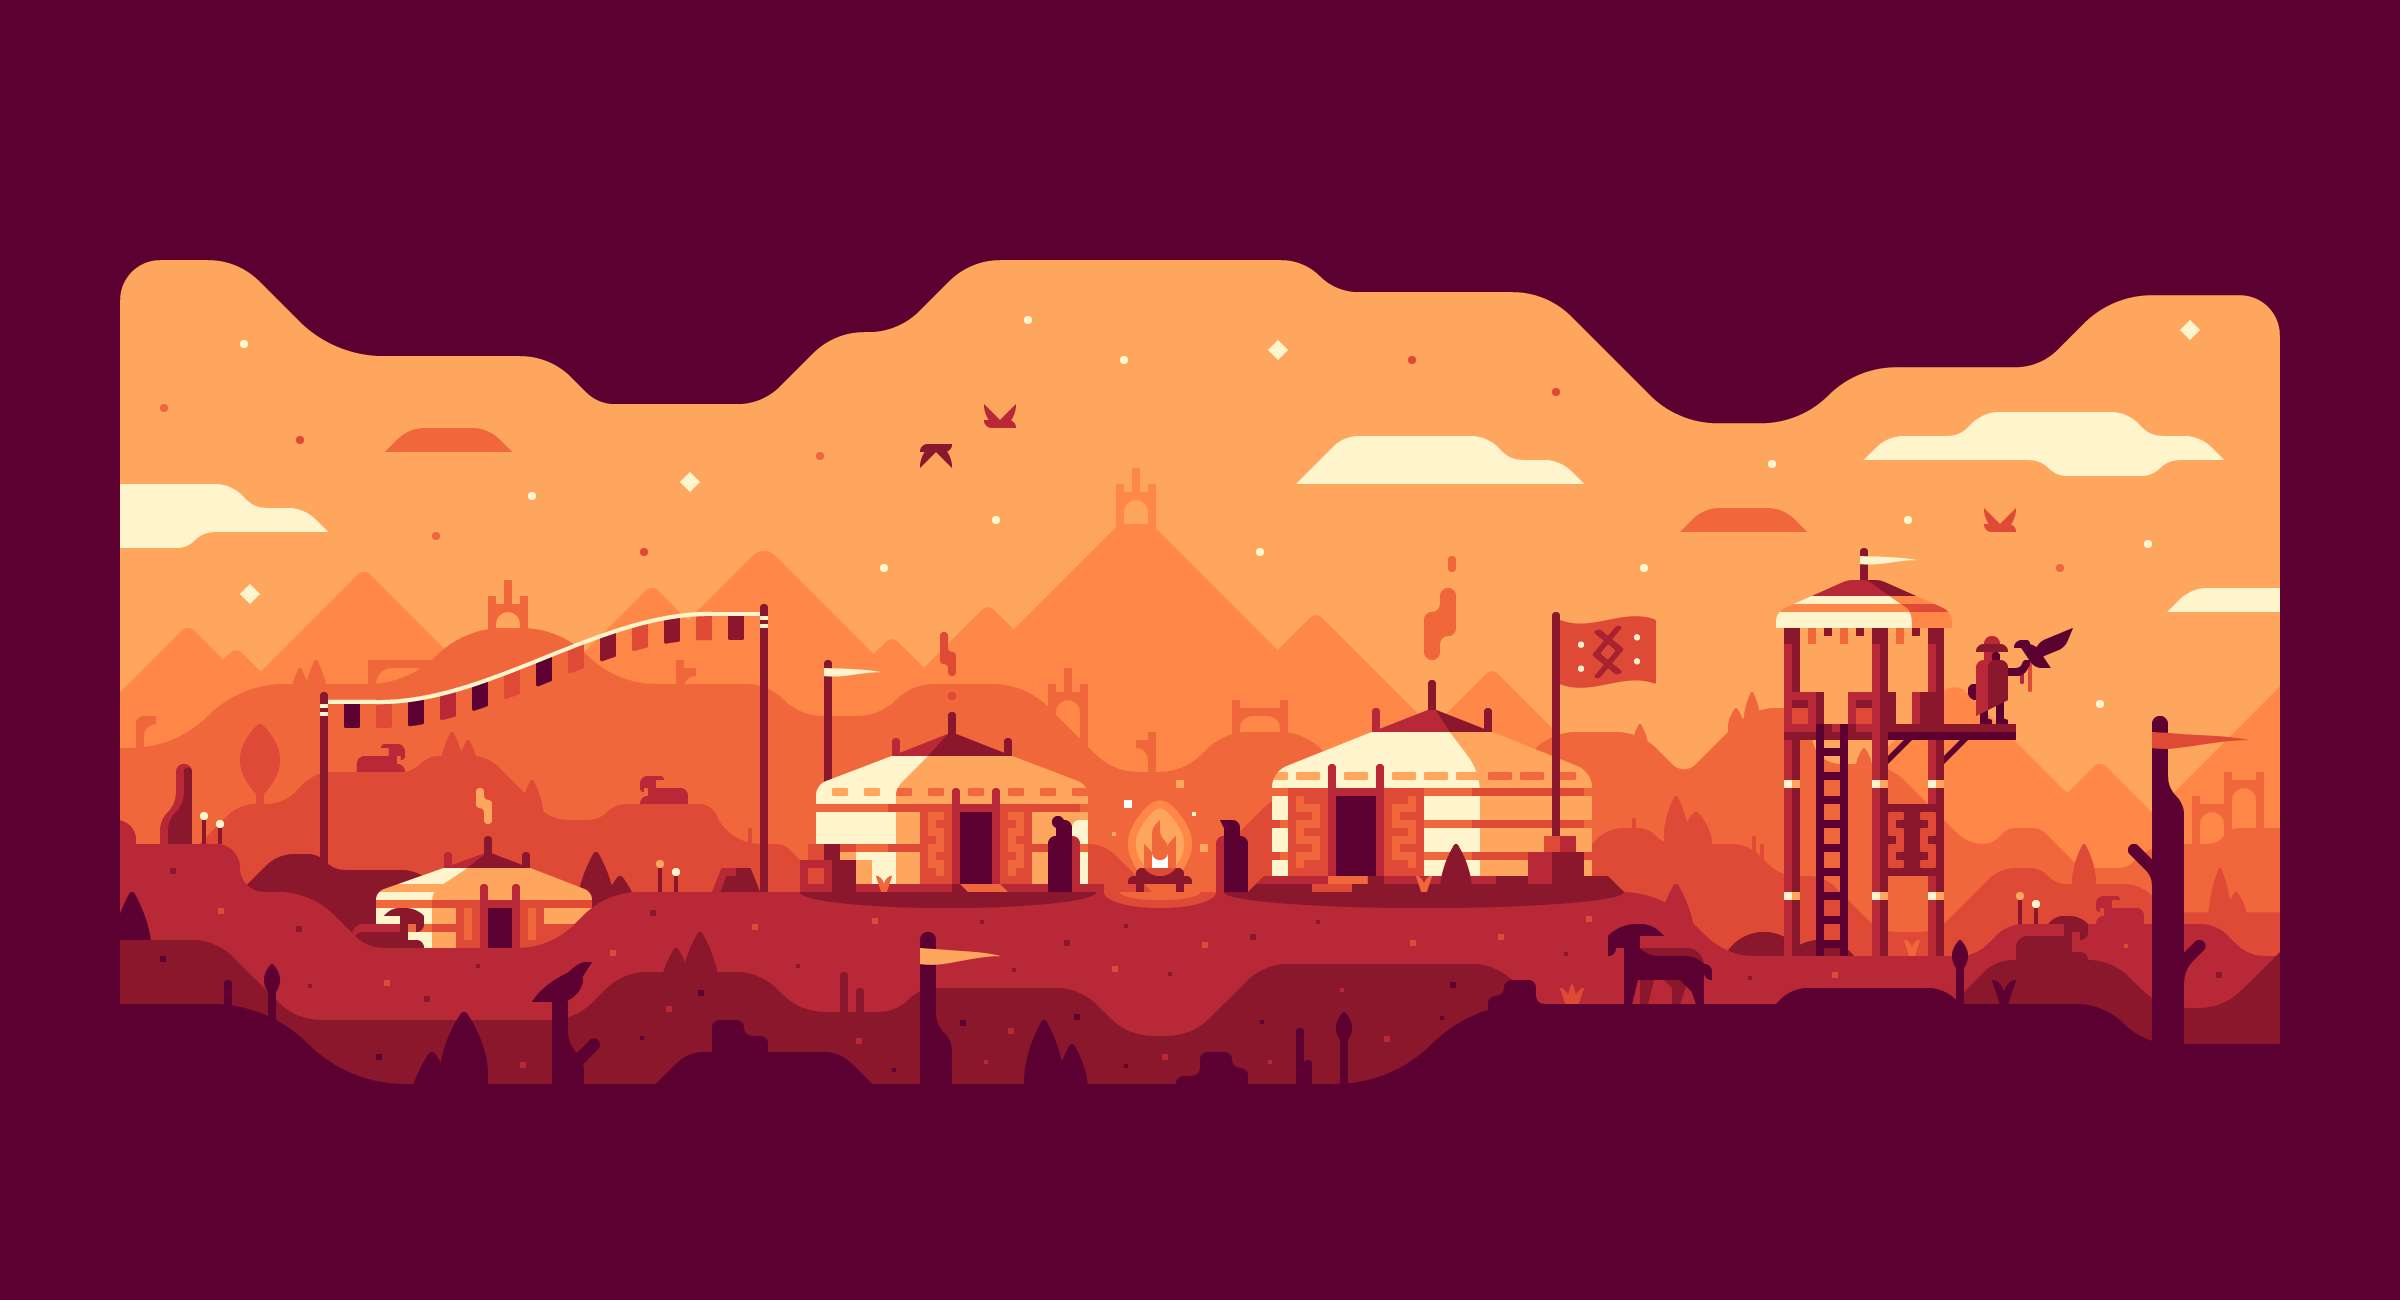 canopy-matt-anderson-yurt-village-game-concept.png